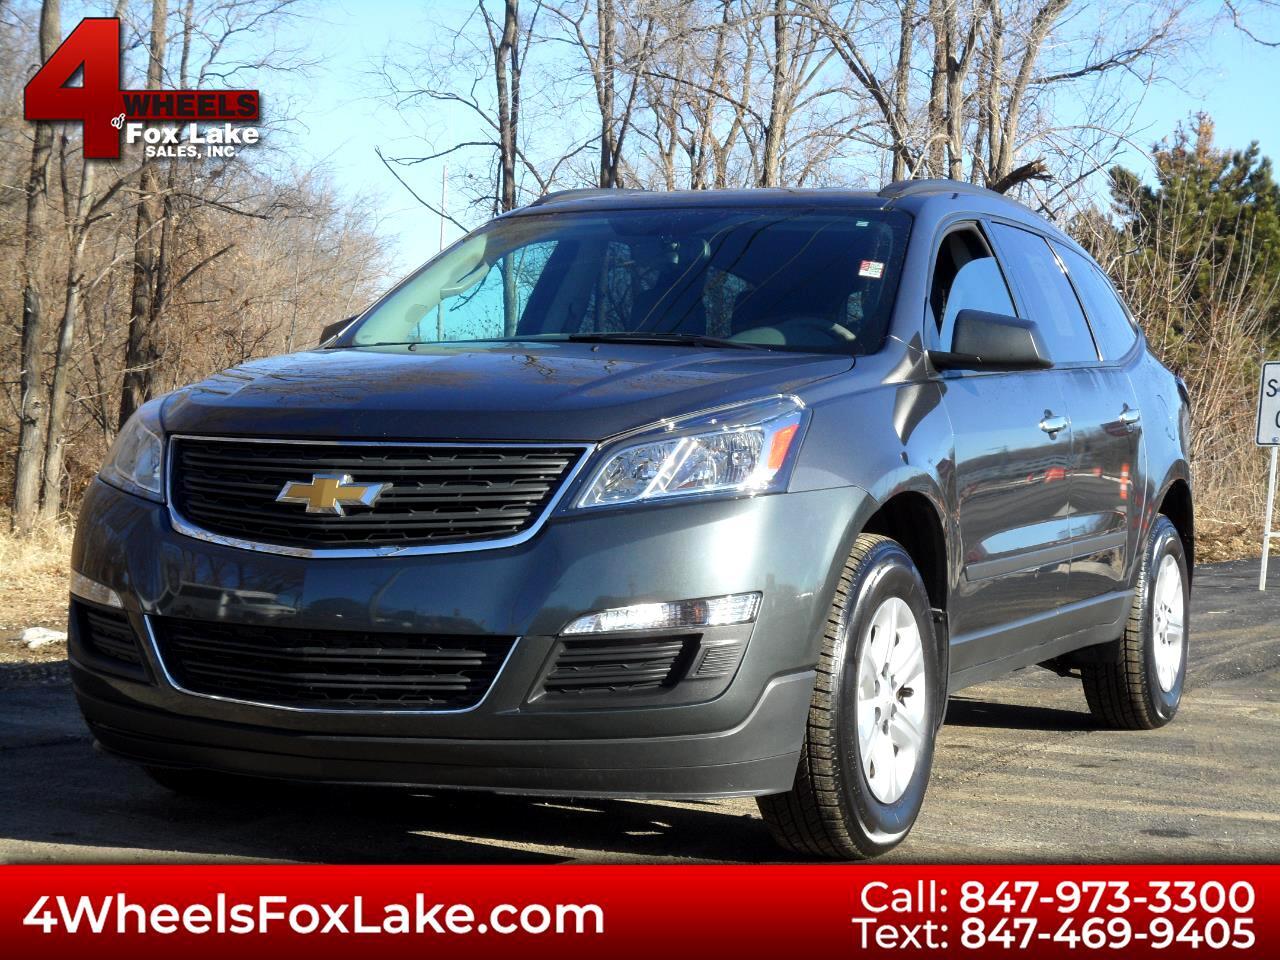 2013 Chevrolet Traverse LS FWD